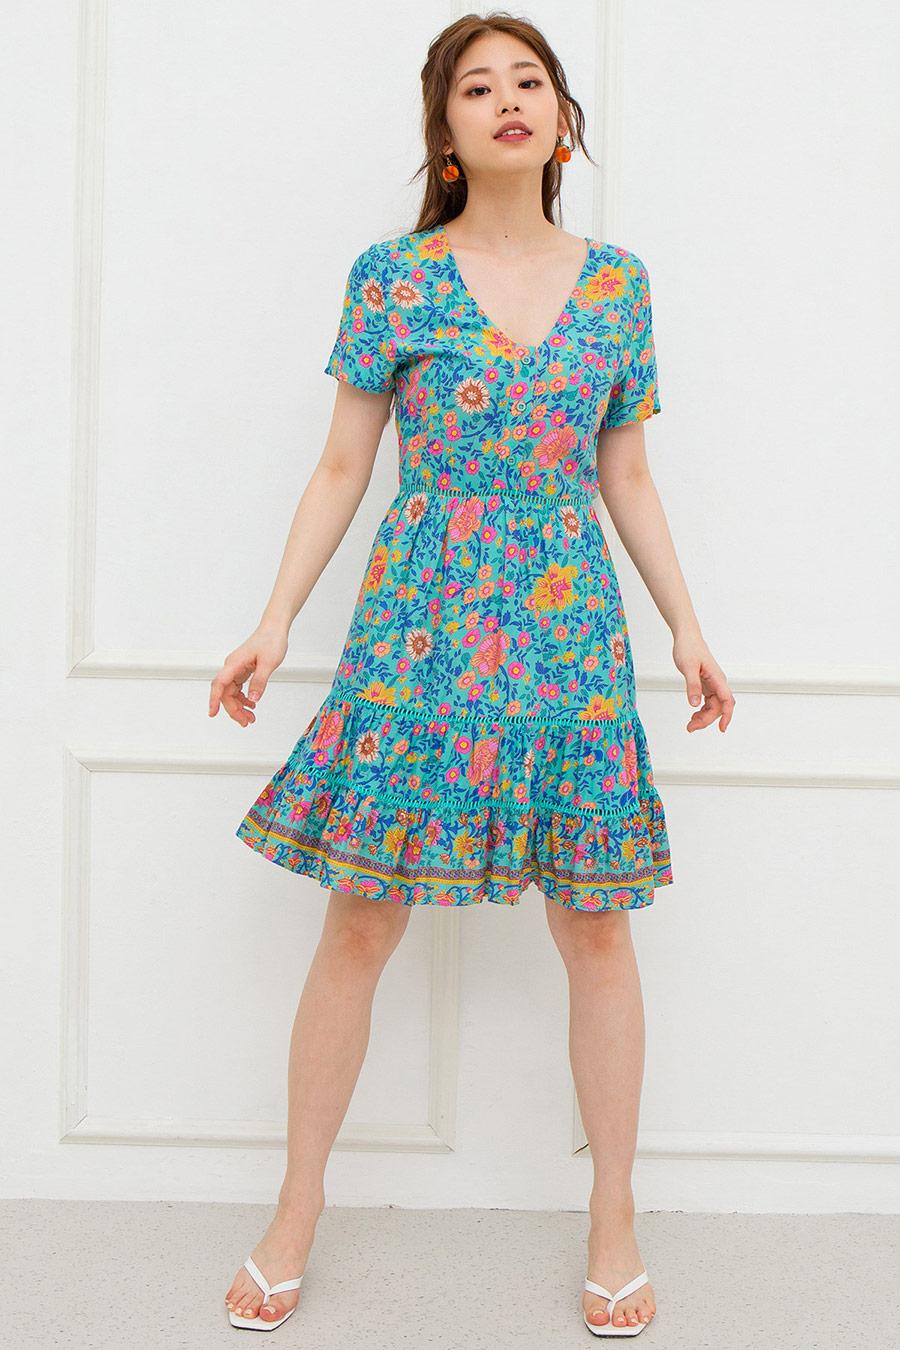 LEAHIE DRESS - NYONYA GLORY